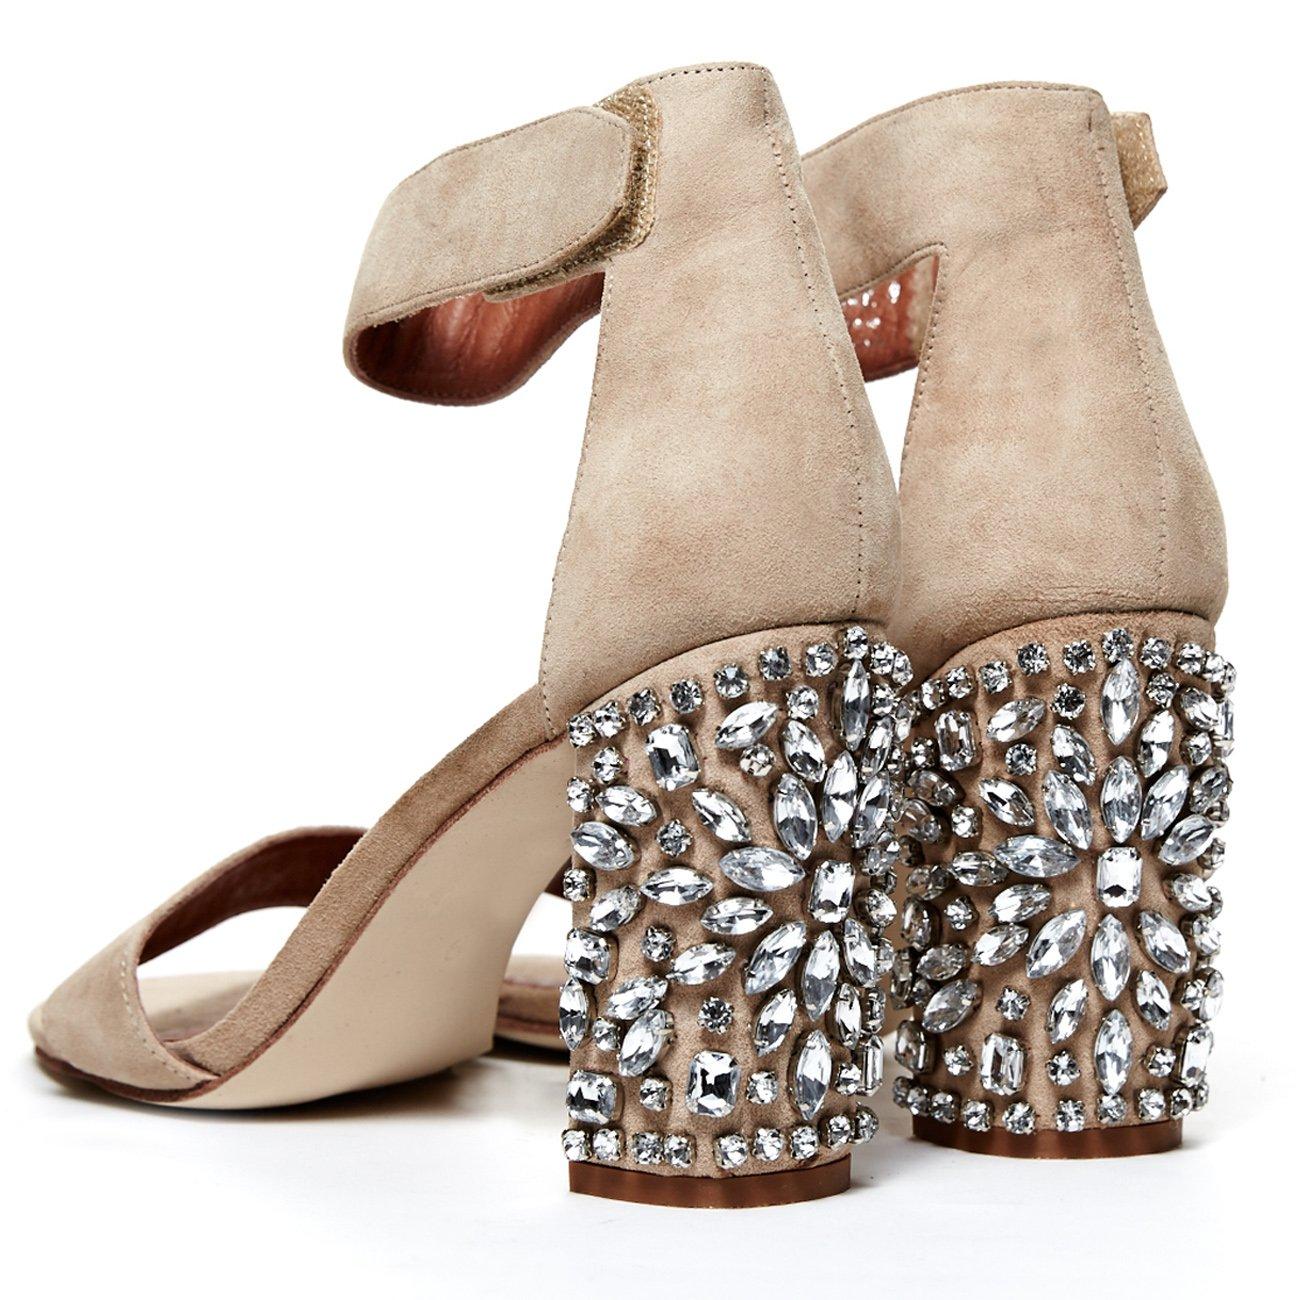 Cold Feet byJeffrey Campbell 'Lindsey Jewel', bling wedding sandal, 10